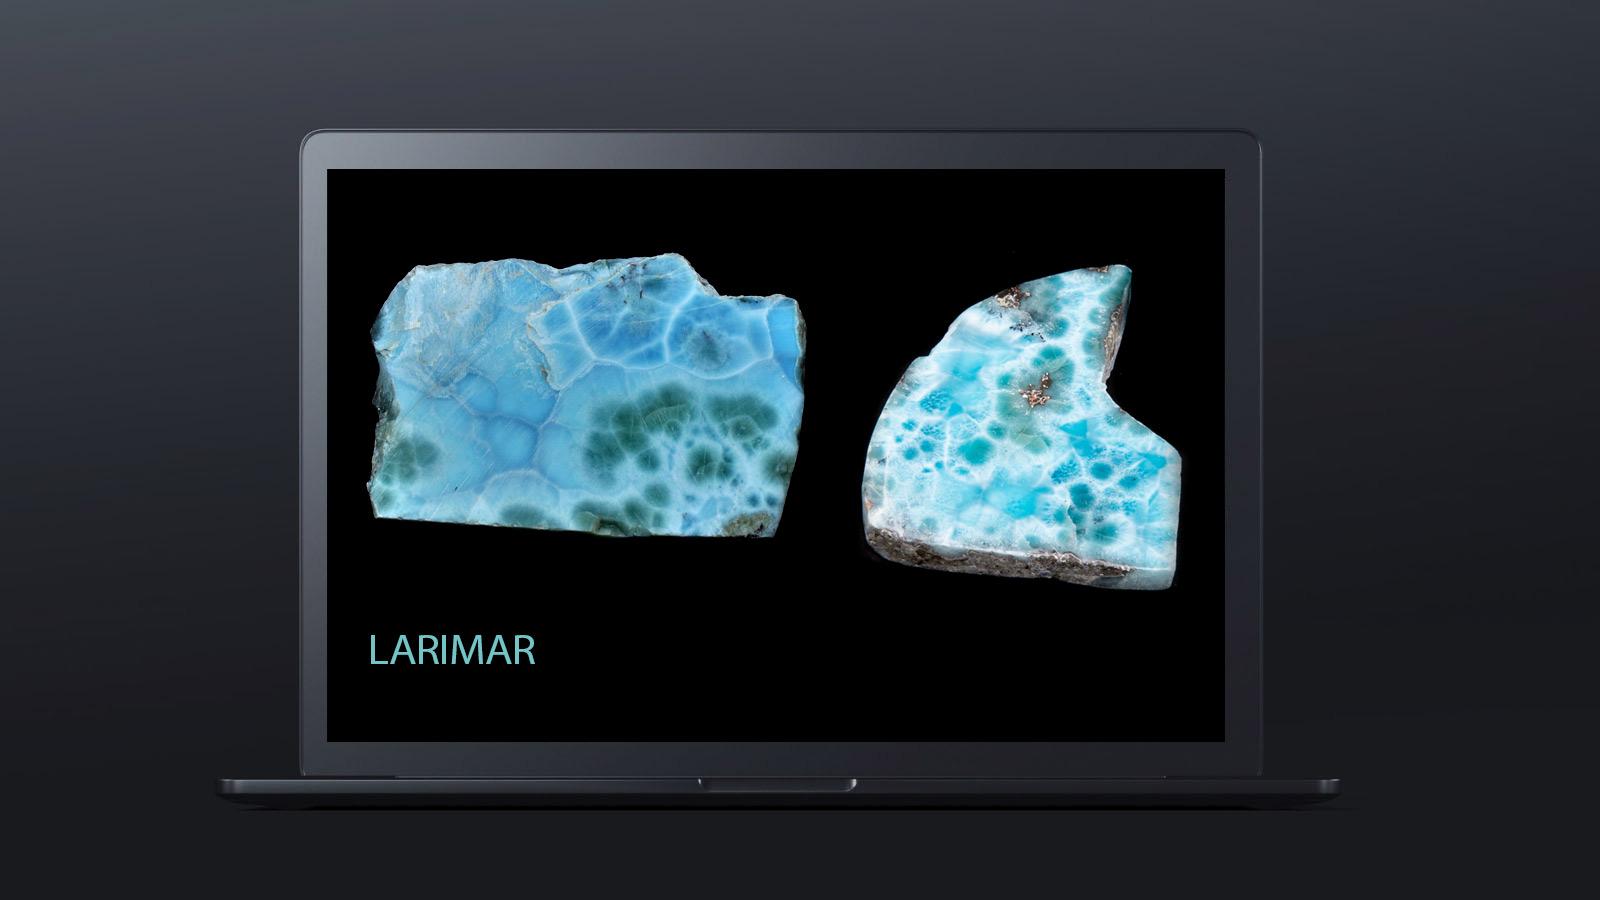 10 worlds rarest gemstones LARIMAR 2 - ده گوهر کمیاب دنیا کدامند؟